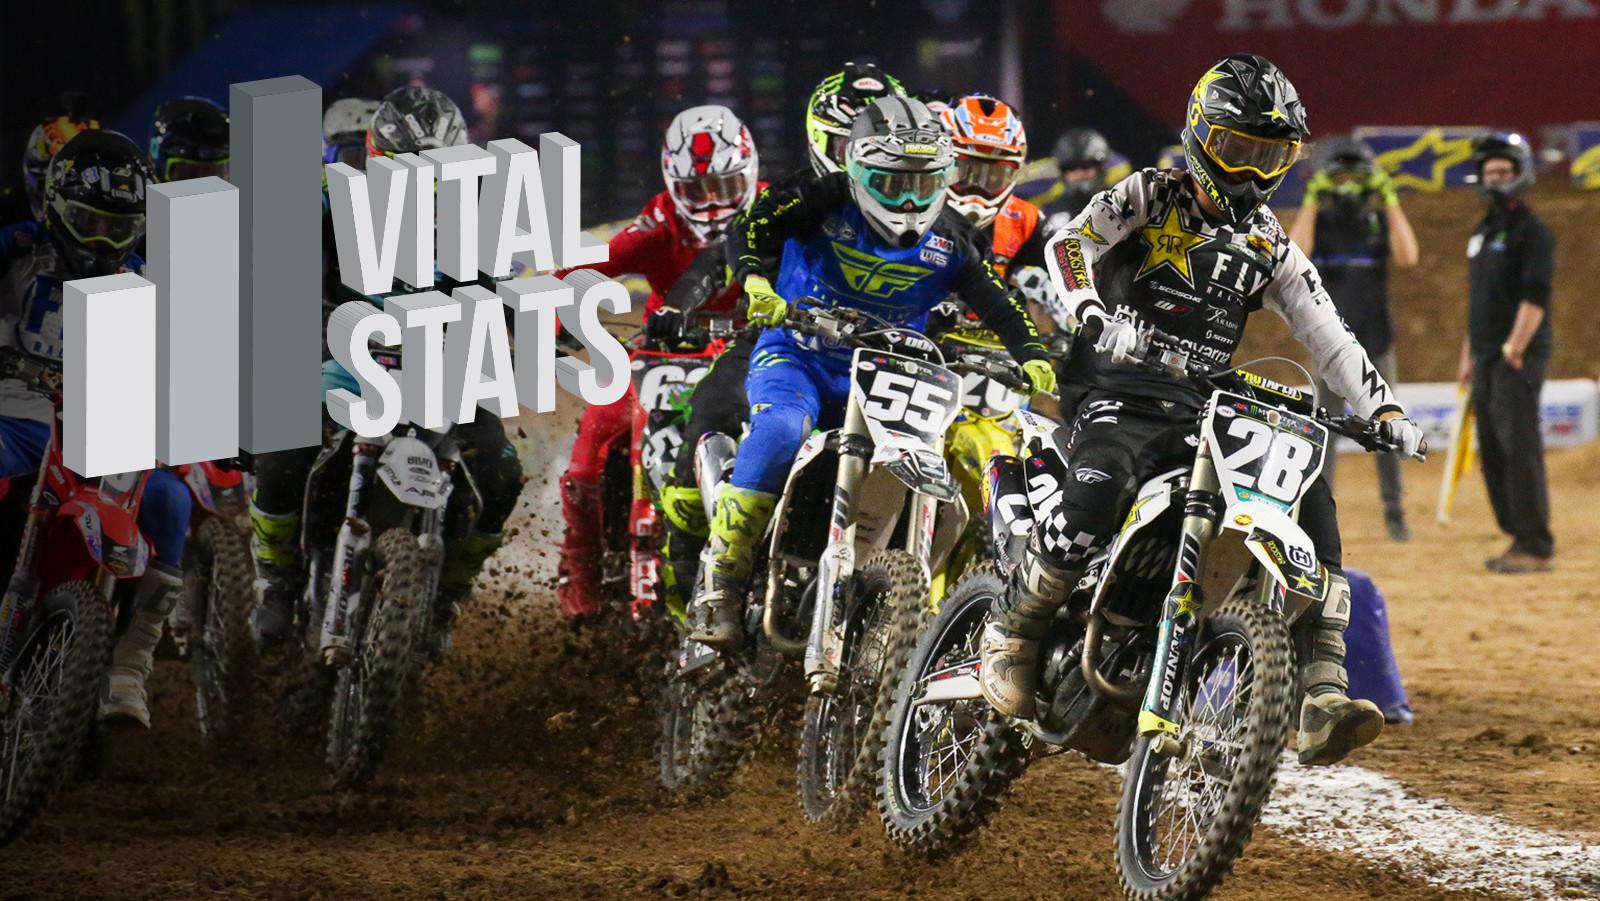 Vital Stats: 2020 Supercross Championship, Week 4